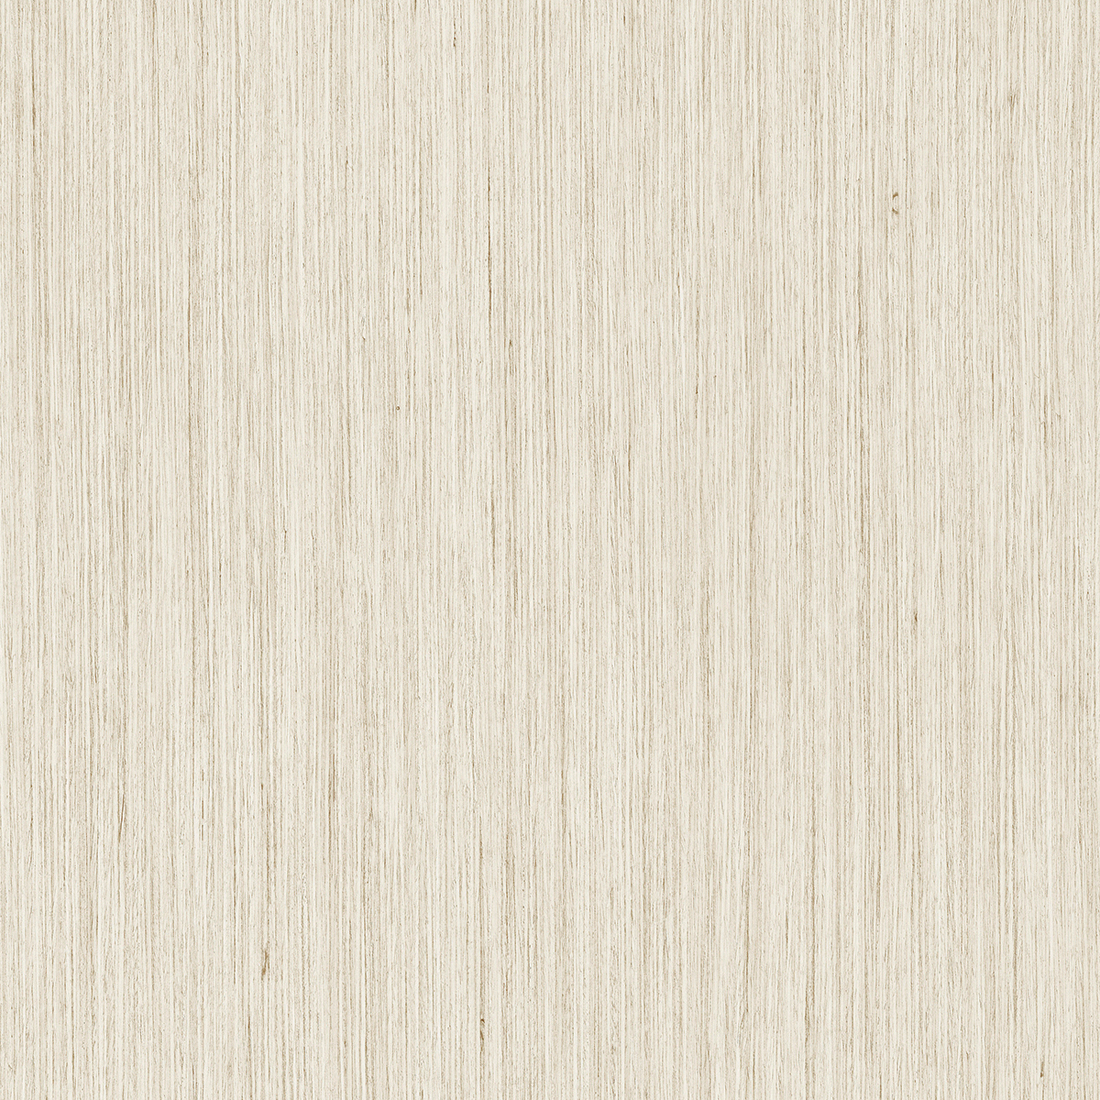 8547SN - Fineline Crema